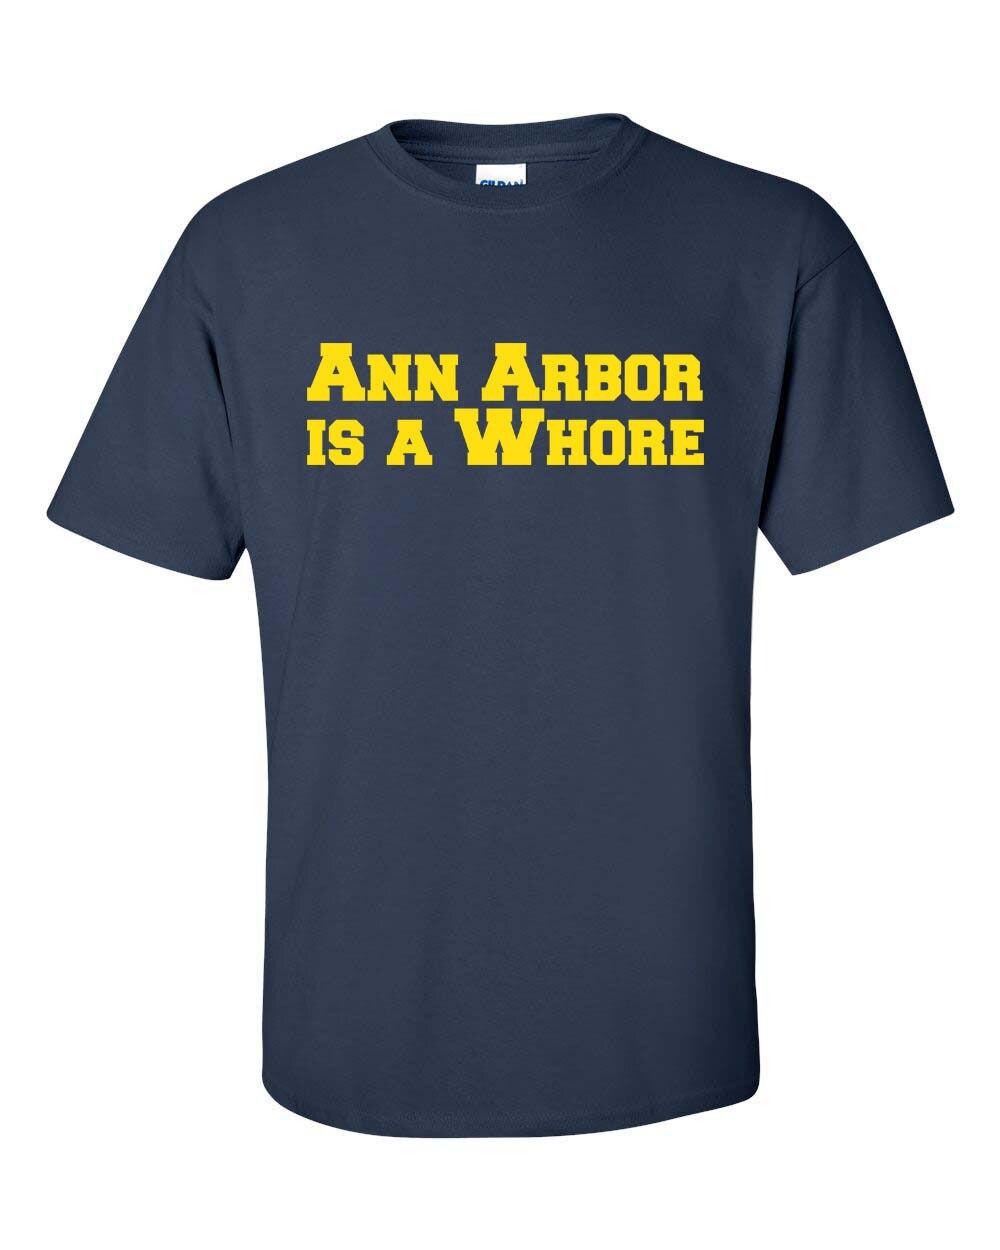 ANN ARBOR is a WHORE Michigan Ohio Funny College Men/'s Tee Shirt 551